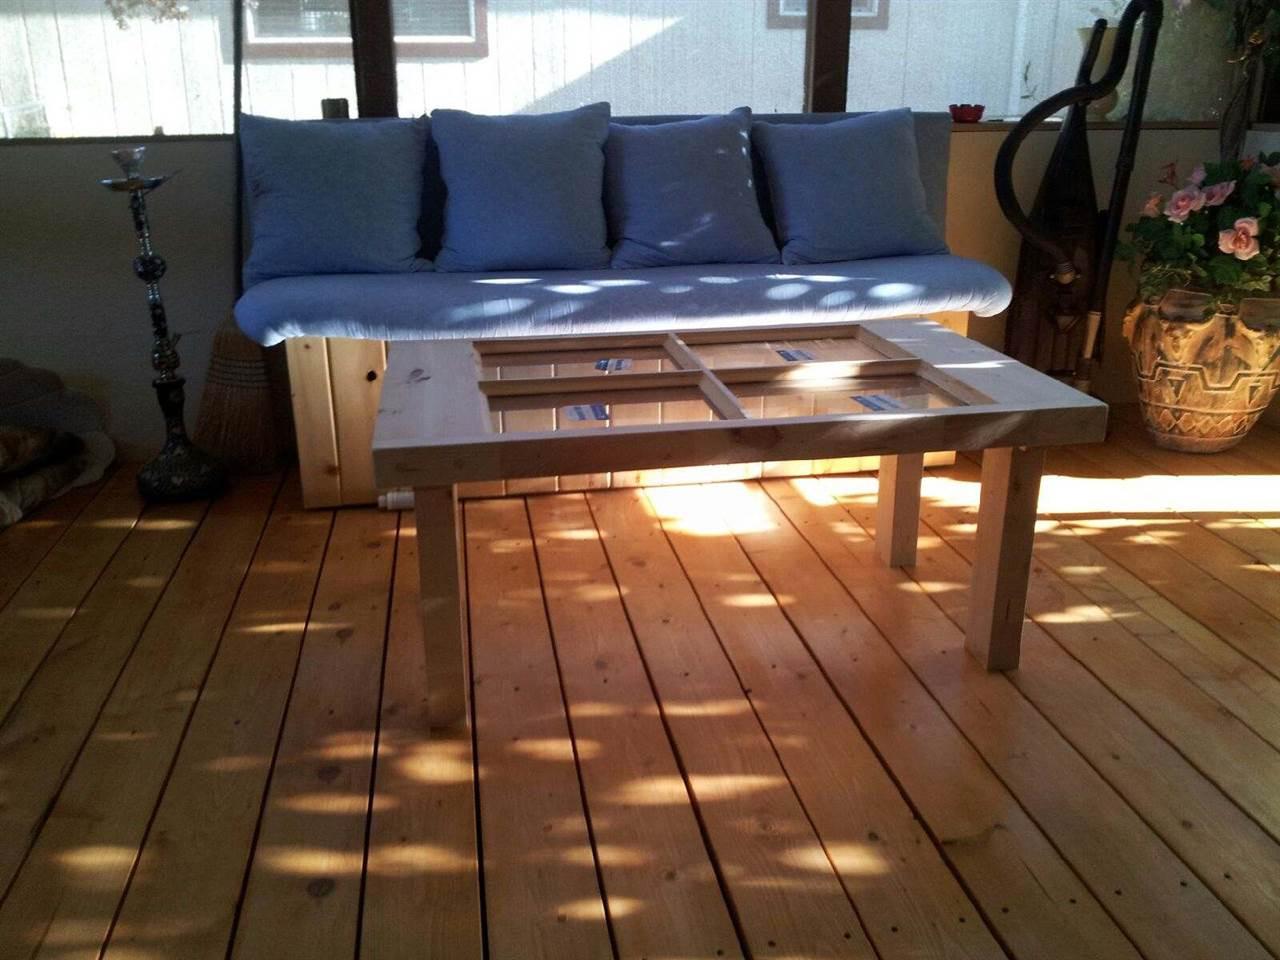 a max hardwood floors boise of 8513 blue mountain ln boise 83716 amherst madison real estate for 8513 blue mountain ln boise